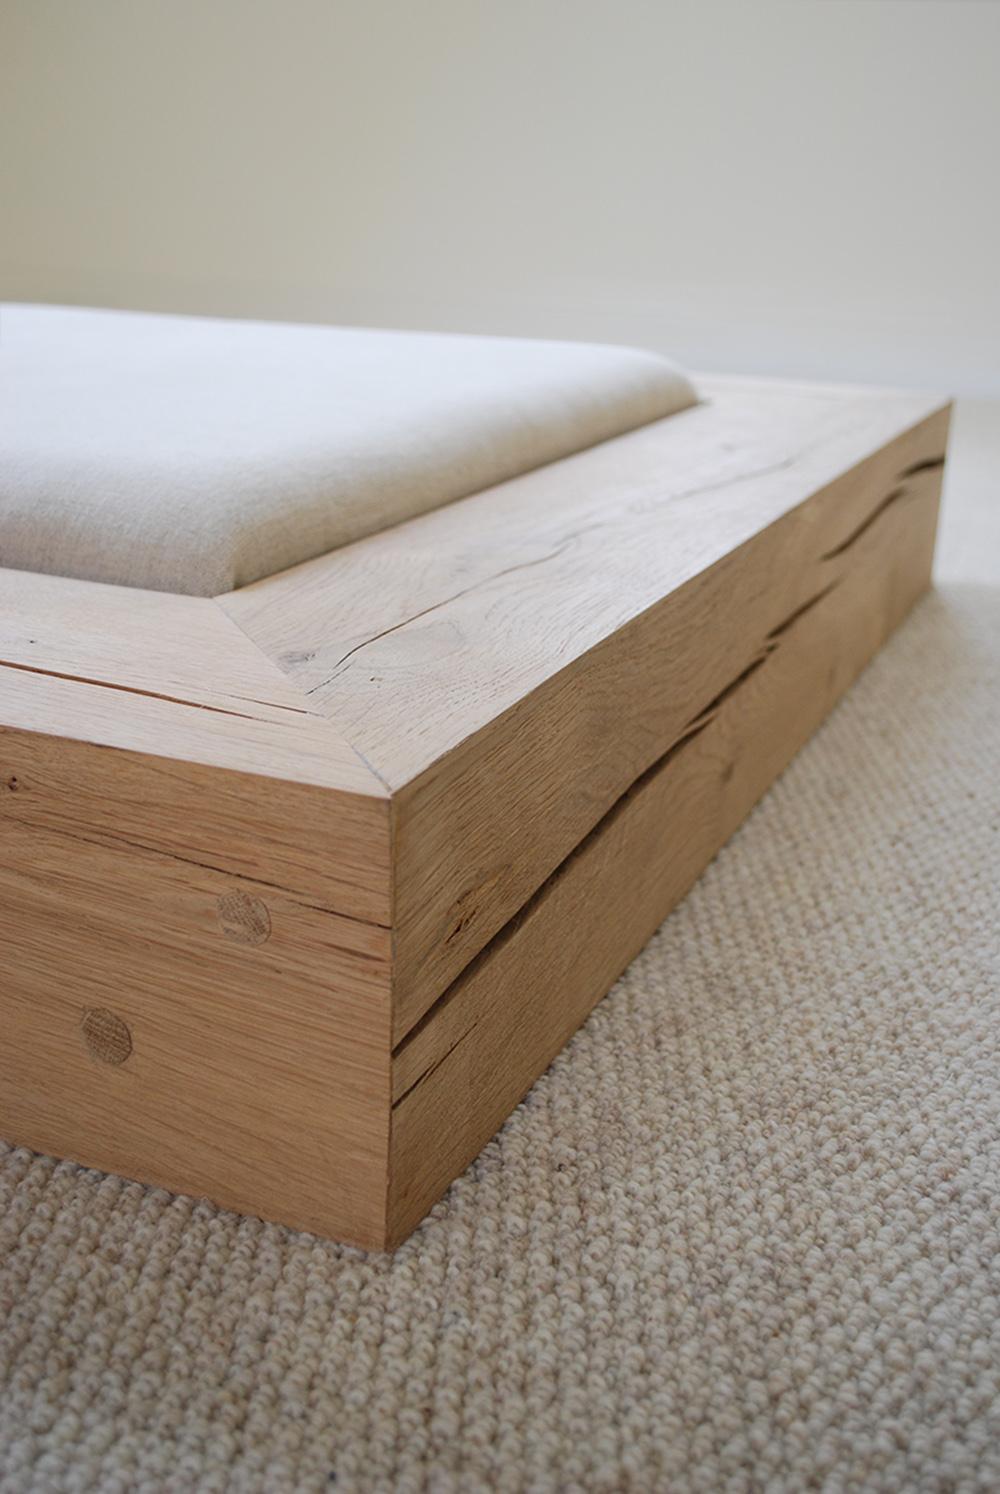 Seat   Oak and upholsterd linen  100cm x 100cm x 20cm 2007